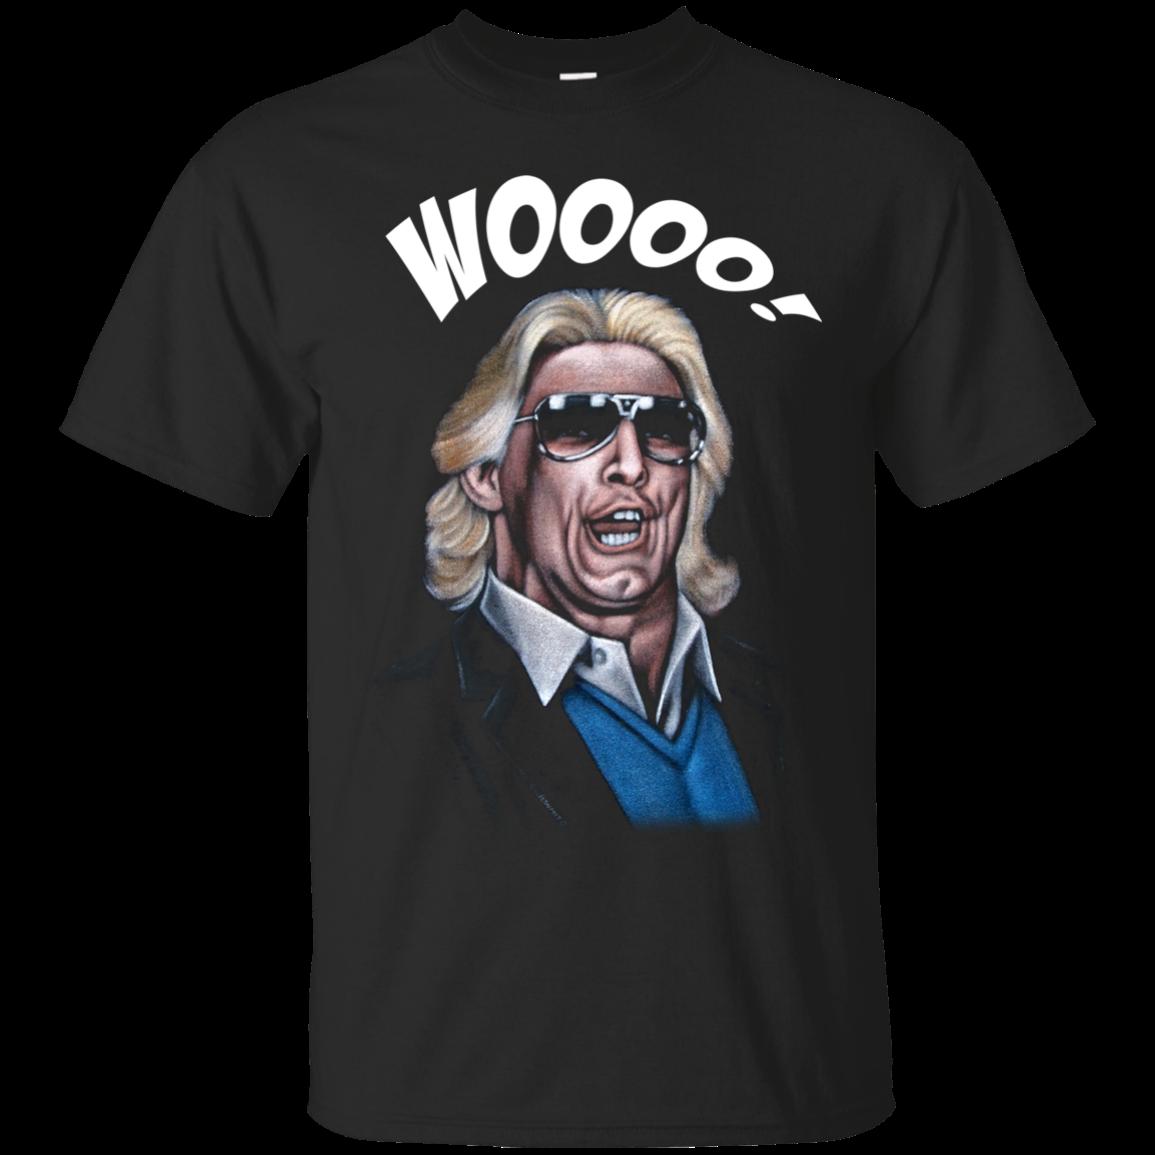 Ric Flair T Shirts Woooo Hoodies Sweatshirts Ugly Christmas